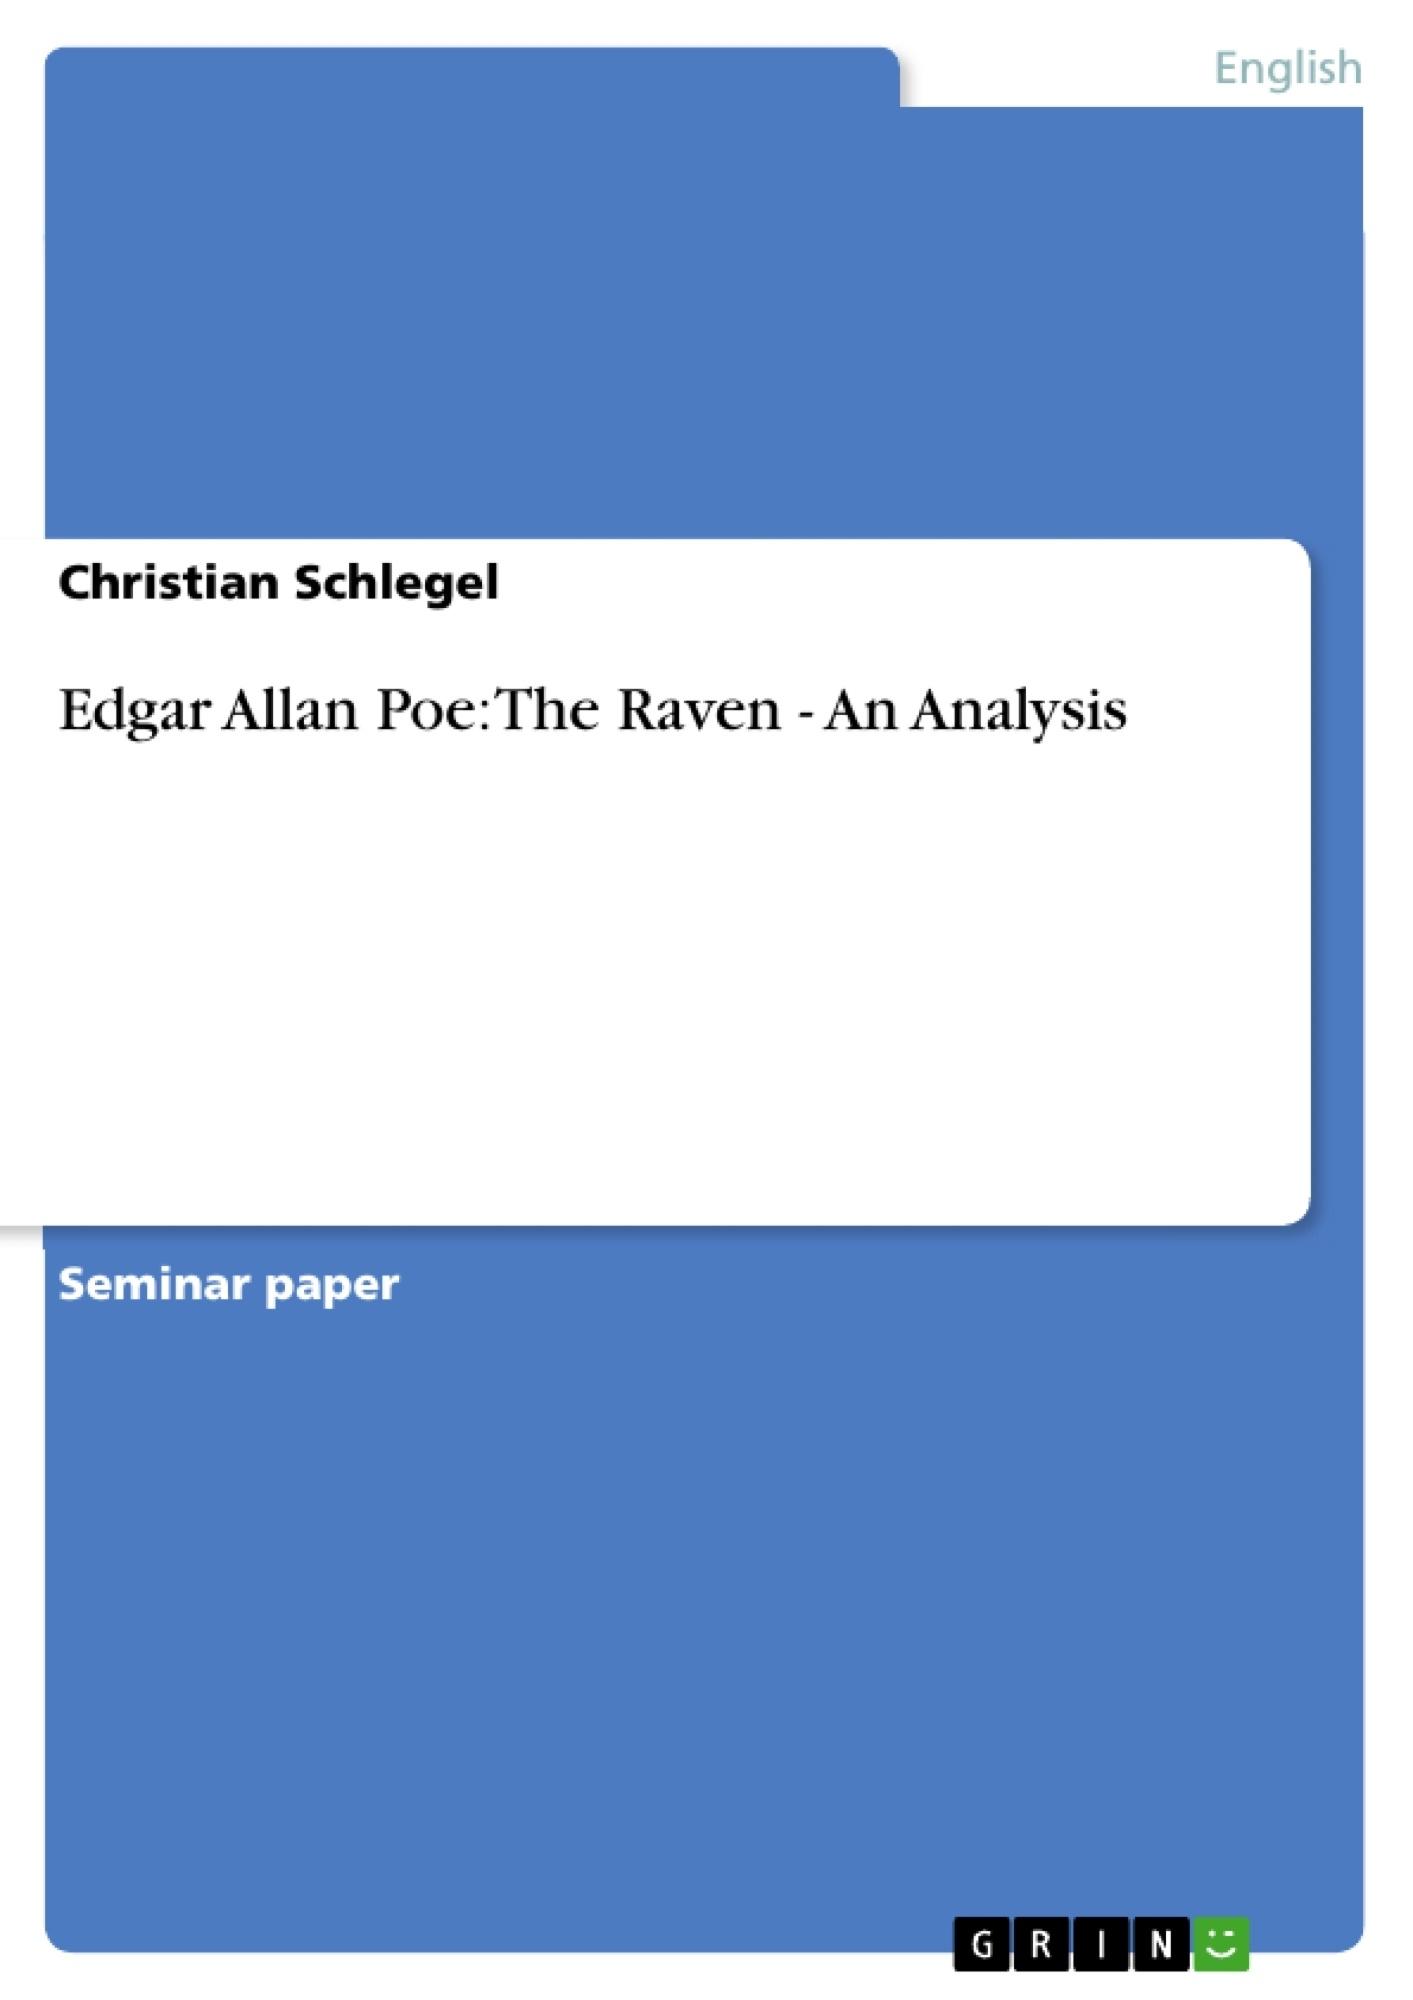 Title: Edgar Allan Poe: The Raven - An Analysis